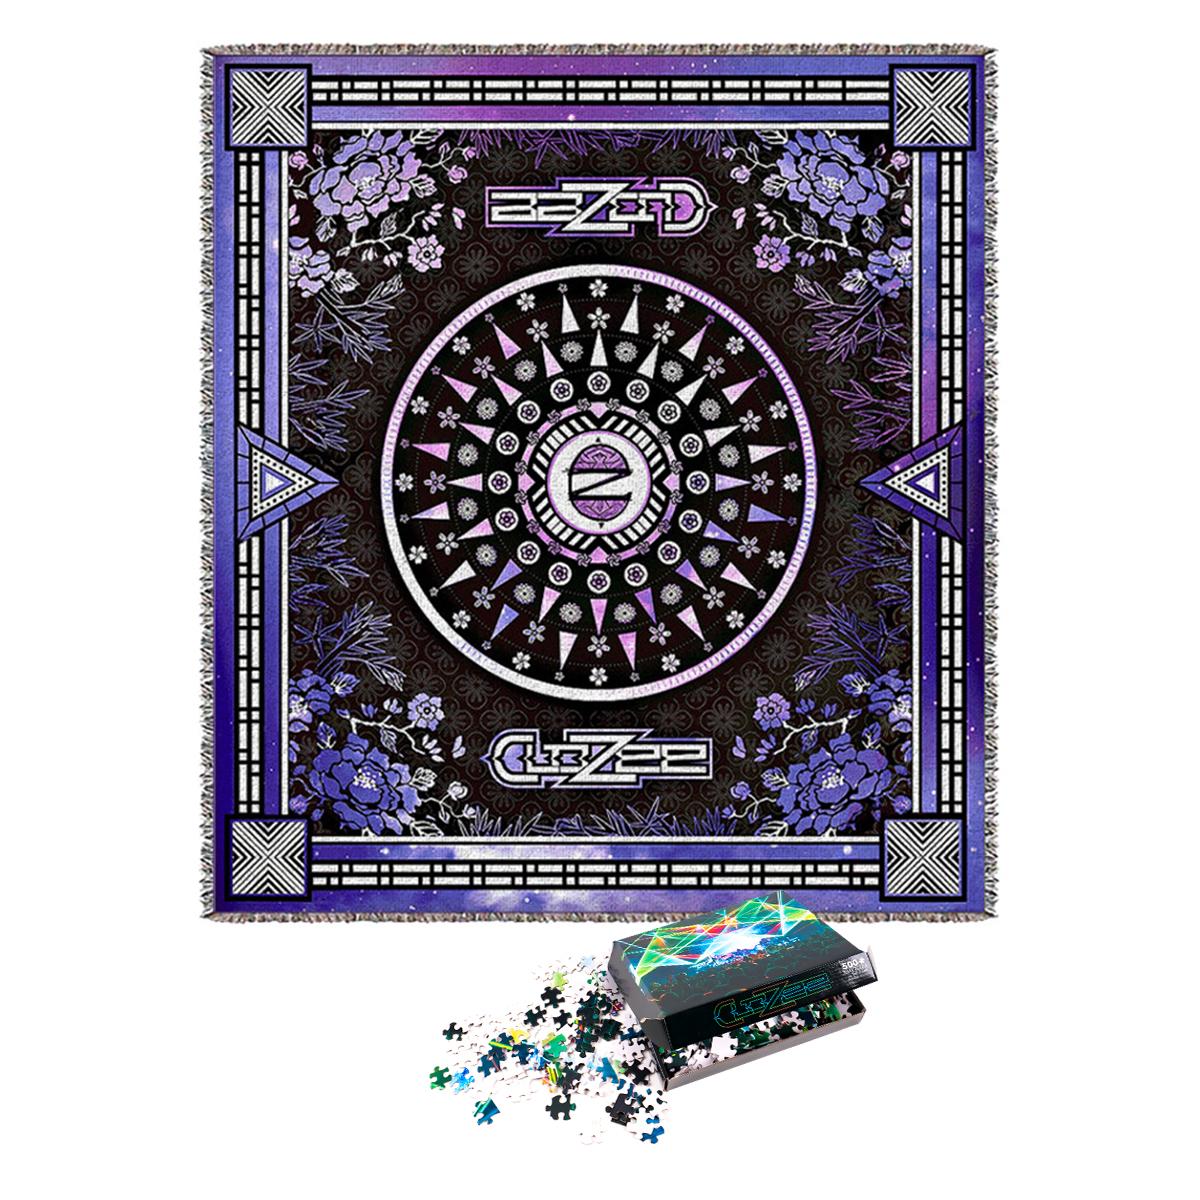 Twilight Mirage Blanket + MF Lasers Puzzle Bundle